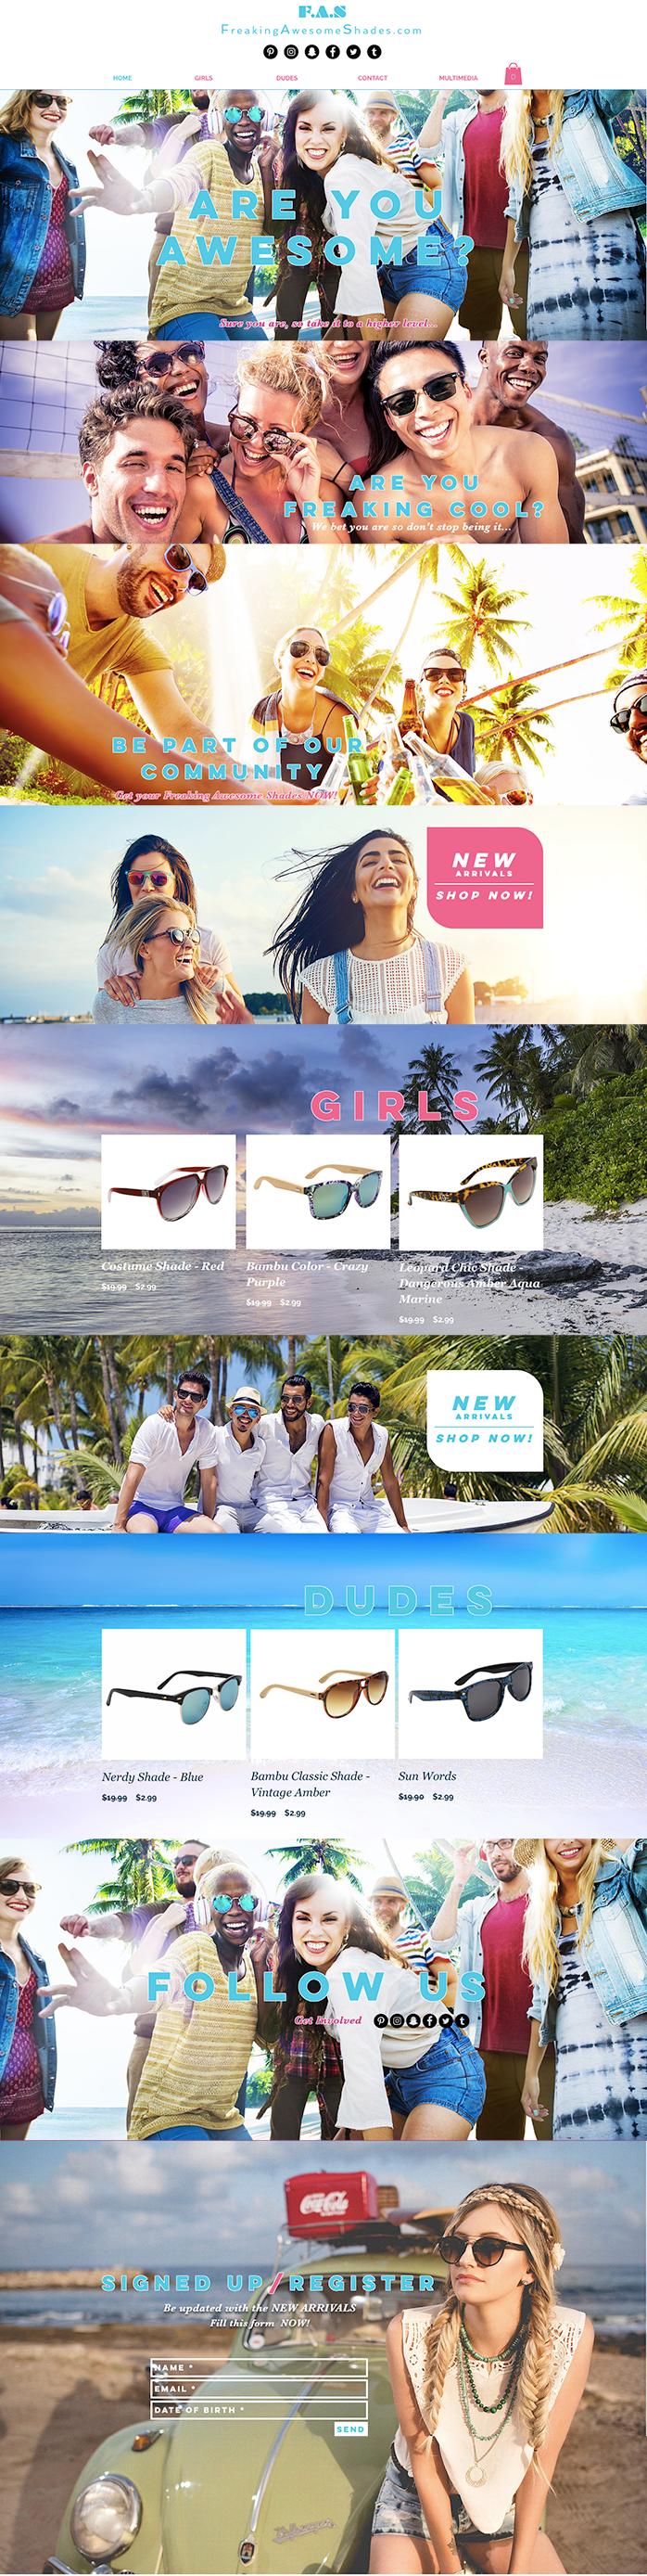 website-design-sunglasses-shop-pembroke-pines.png